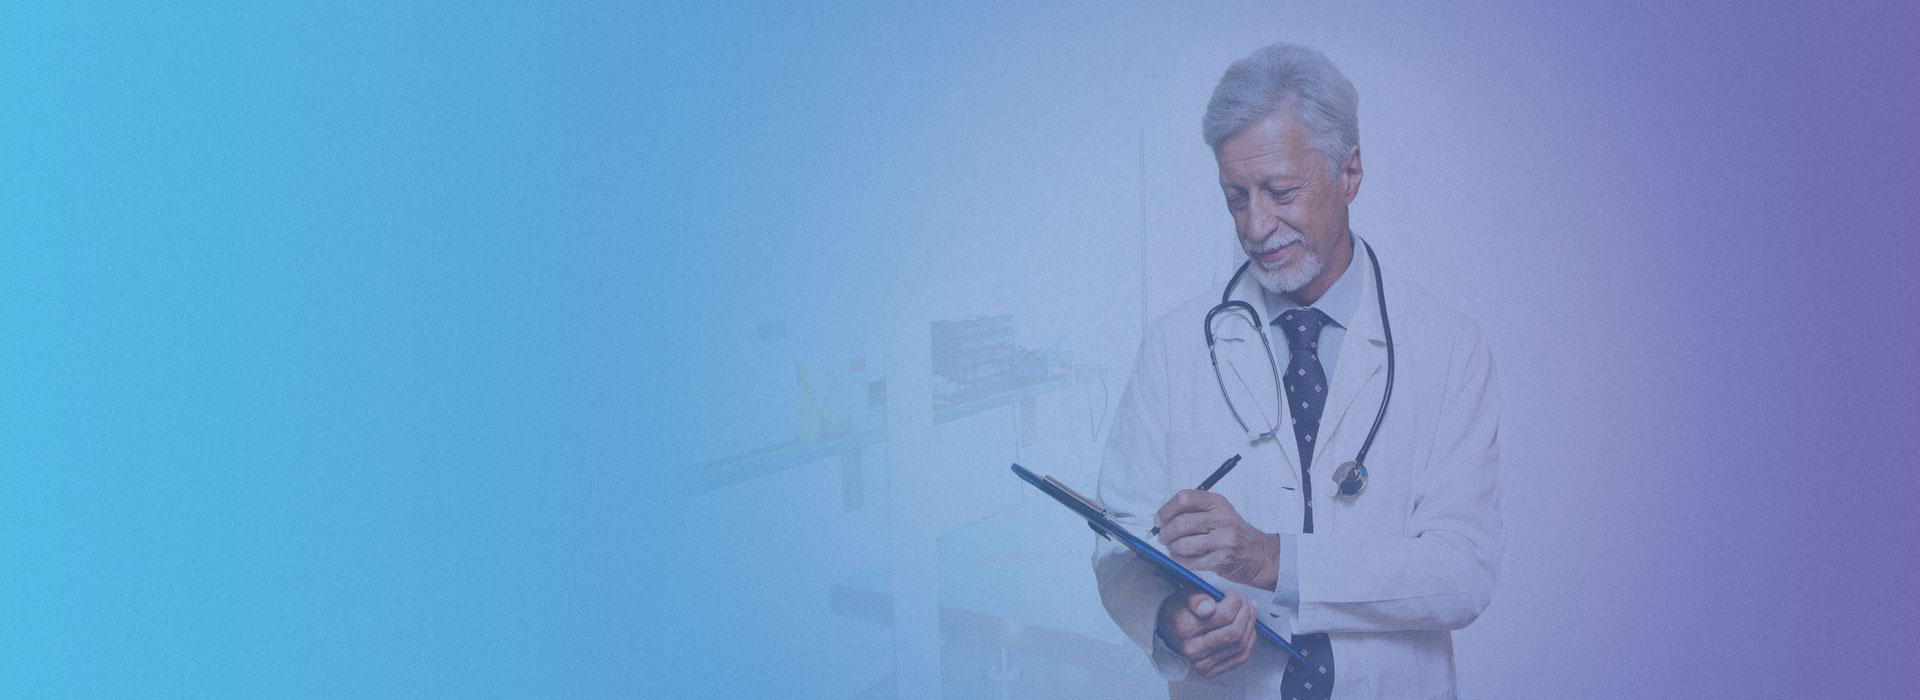 slider-doctor